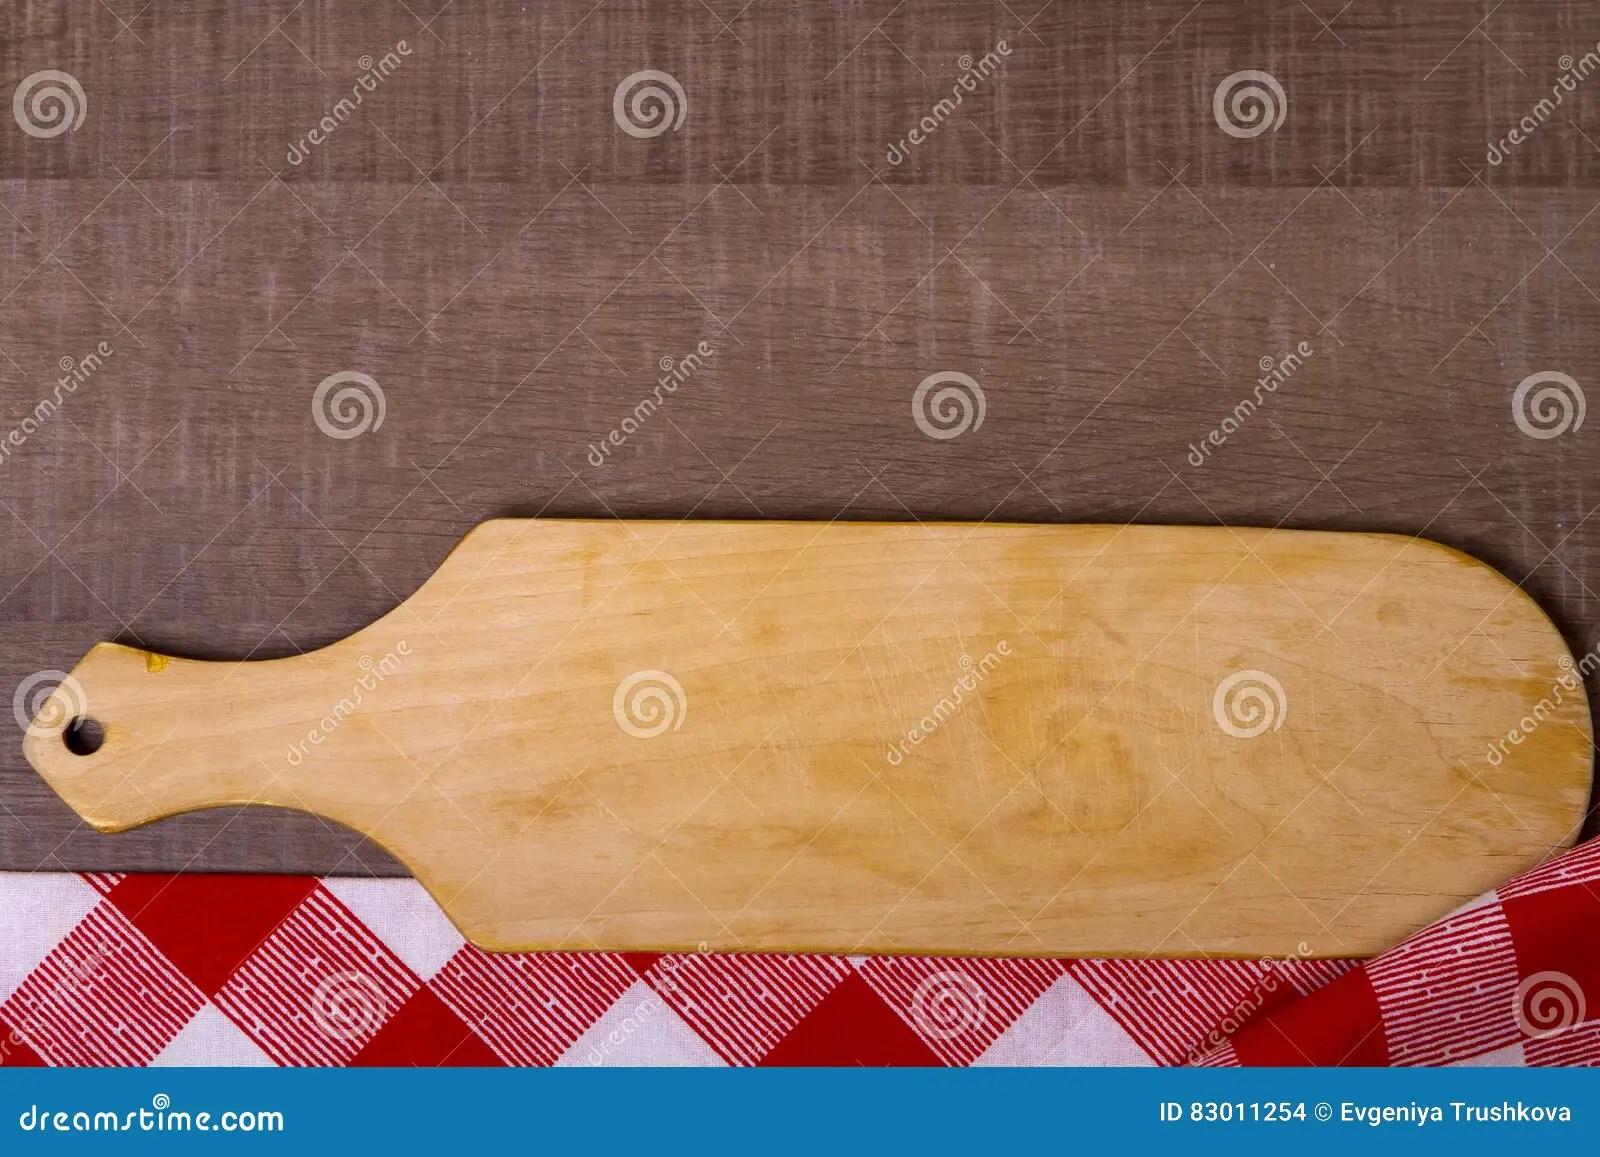 towel for kitchen how much is it to remodel a small 在毛巾的切板在木厨房用桌上库存照片 图片包括有桌布 设计 干净 剪切 在毛巾的切板在木厨房用桌上